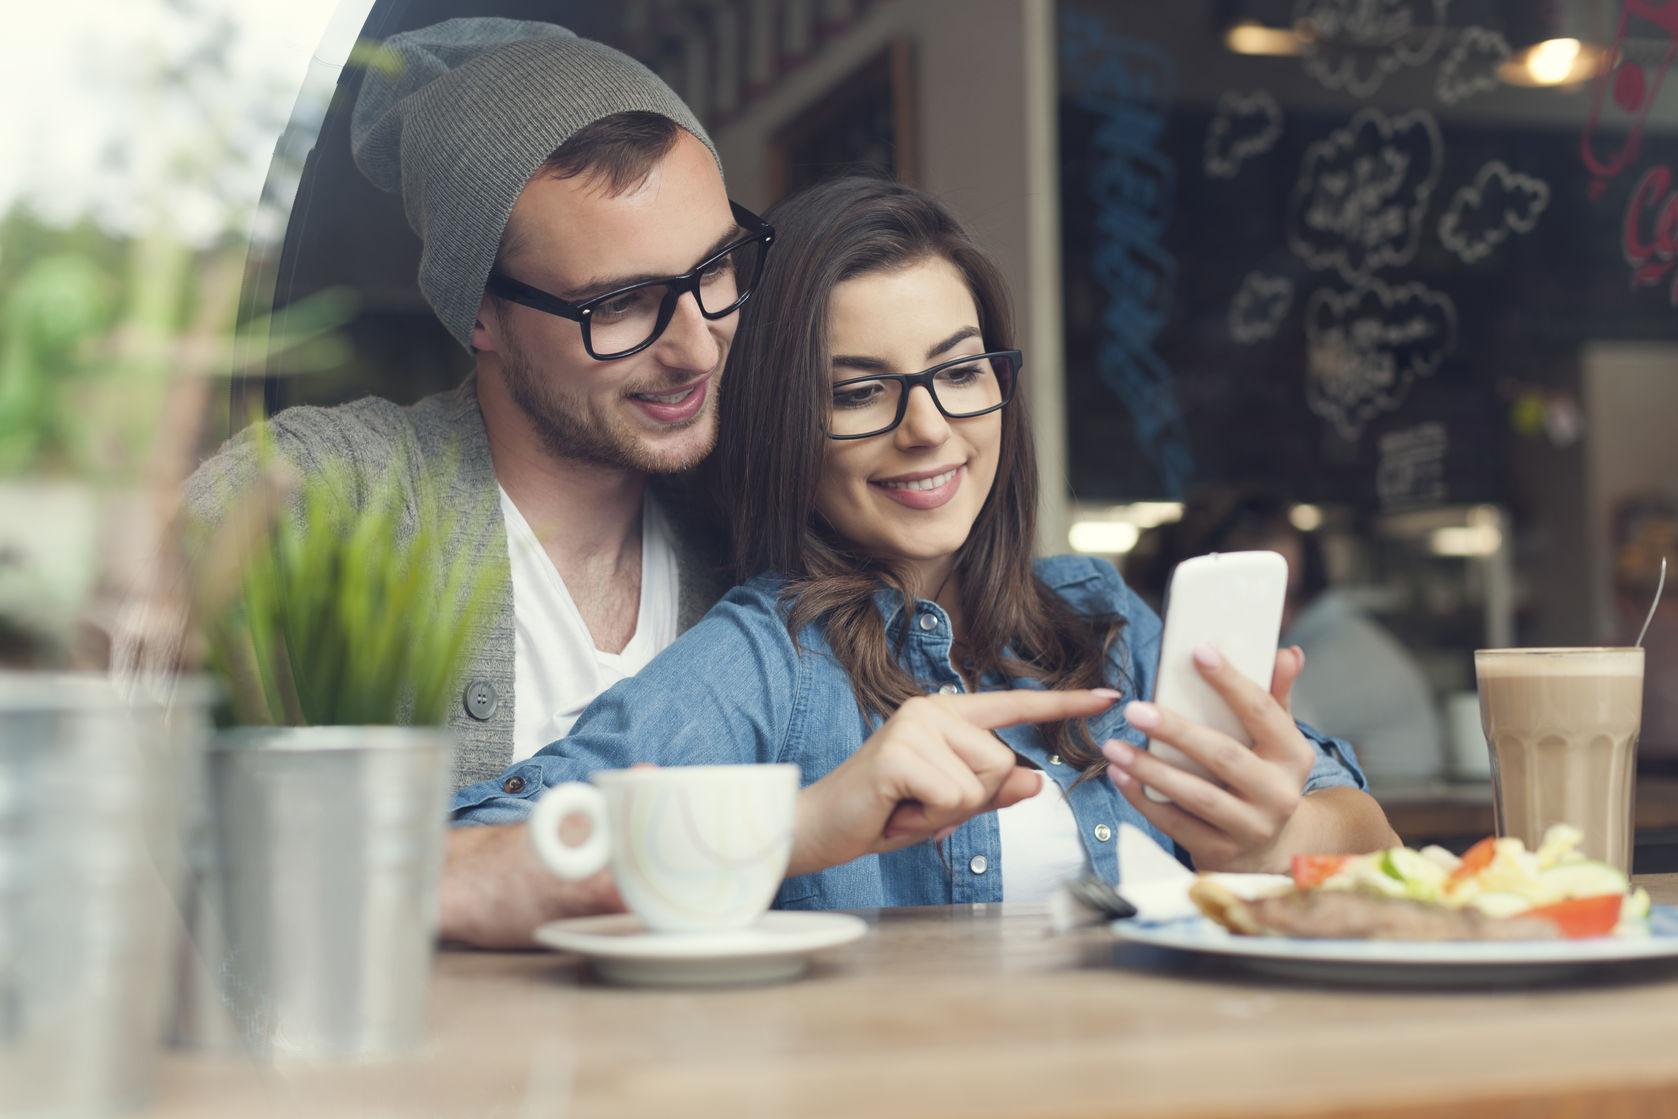 Nuevos perfiles de consumidores - Pareja hipster